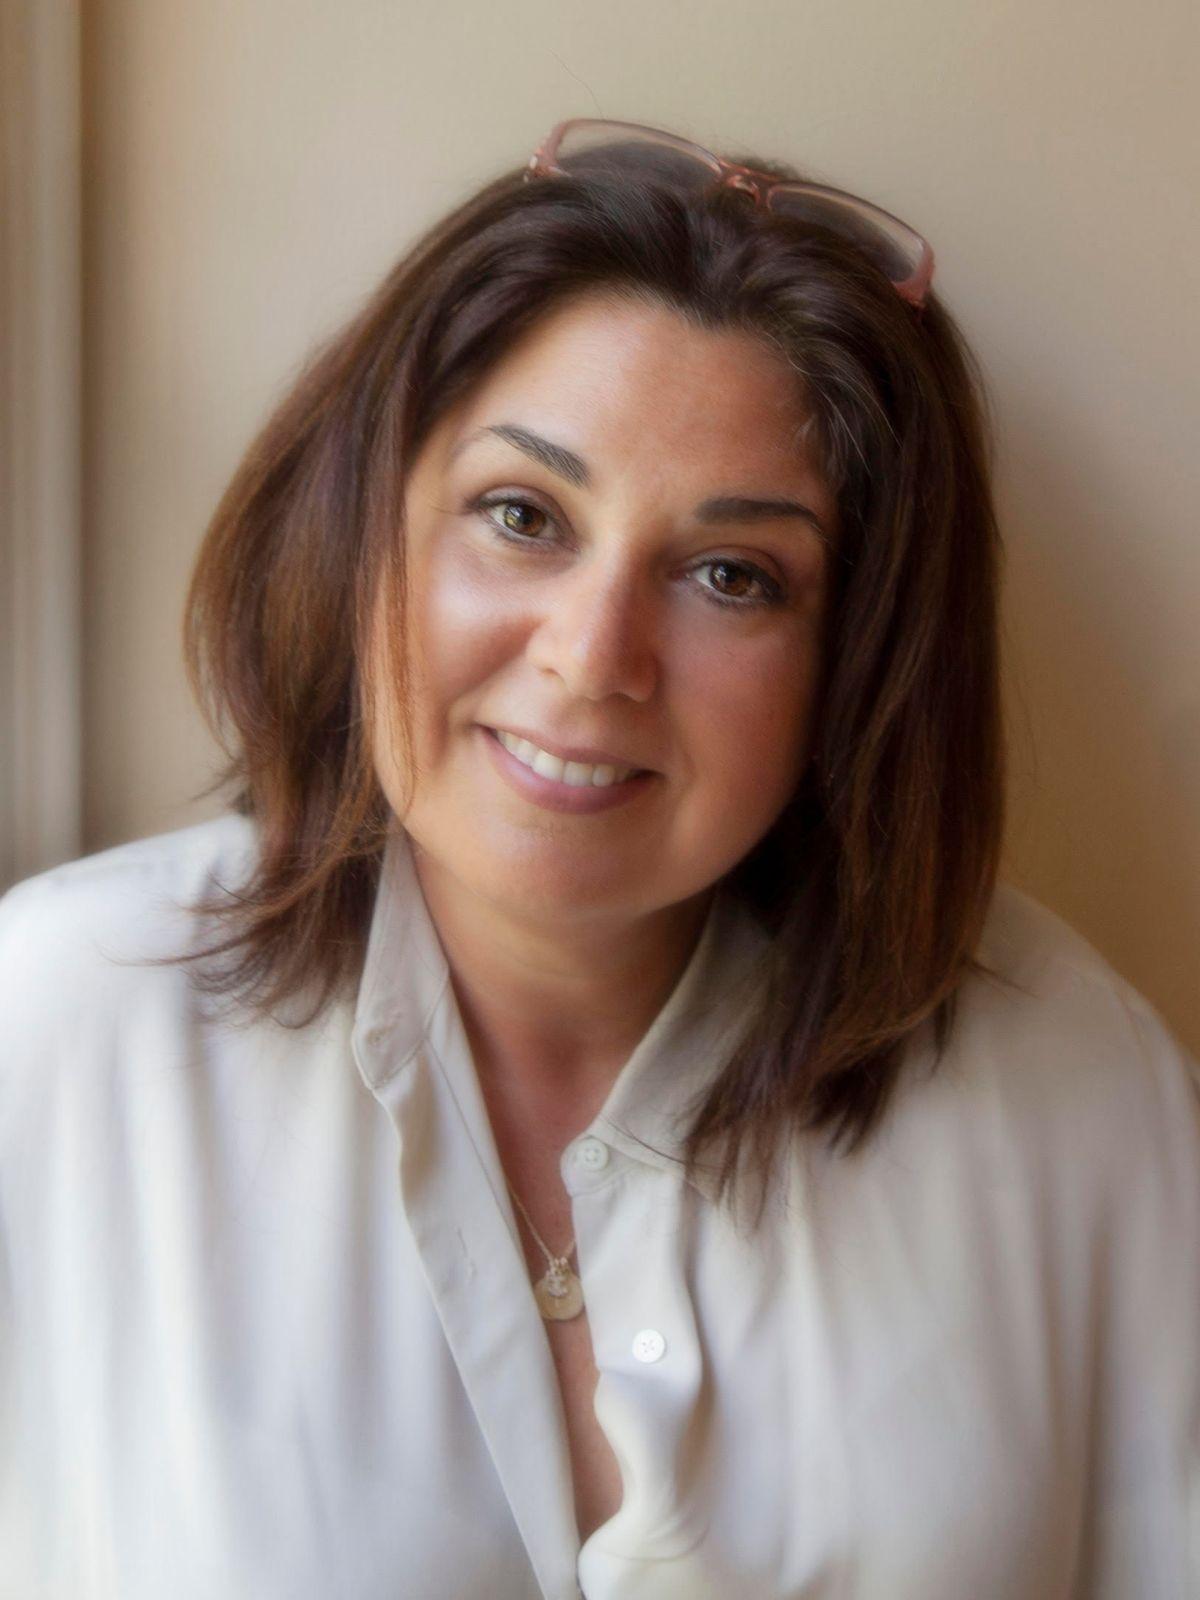 fuboTV Announces Gina DiGioia Sheldon as General Counsel, fuboTV